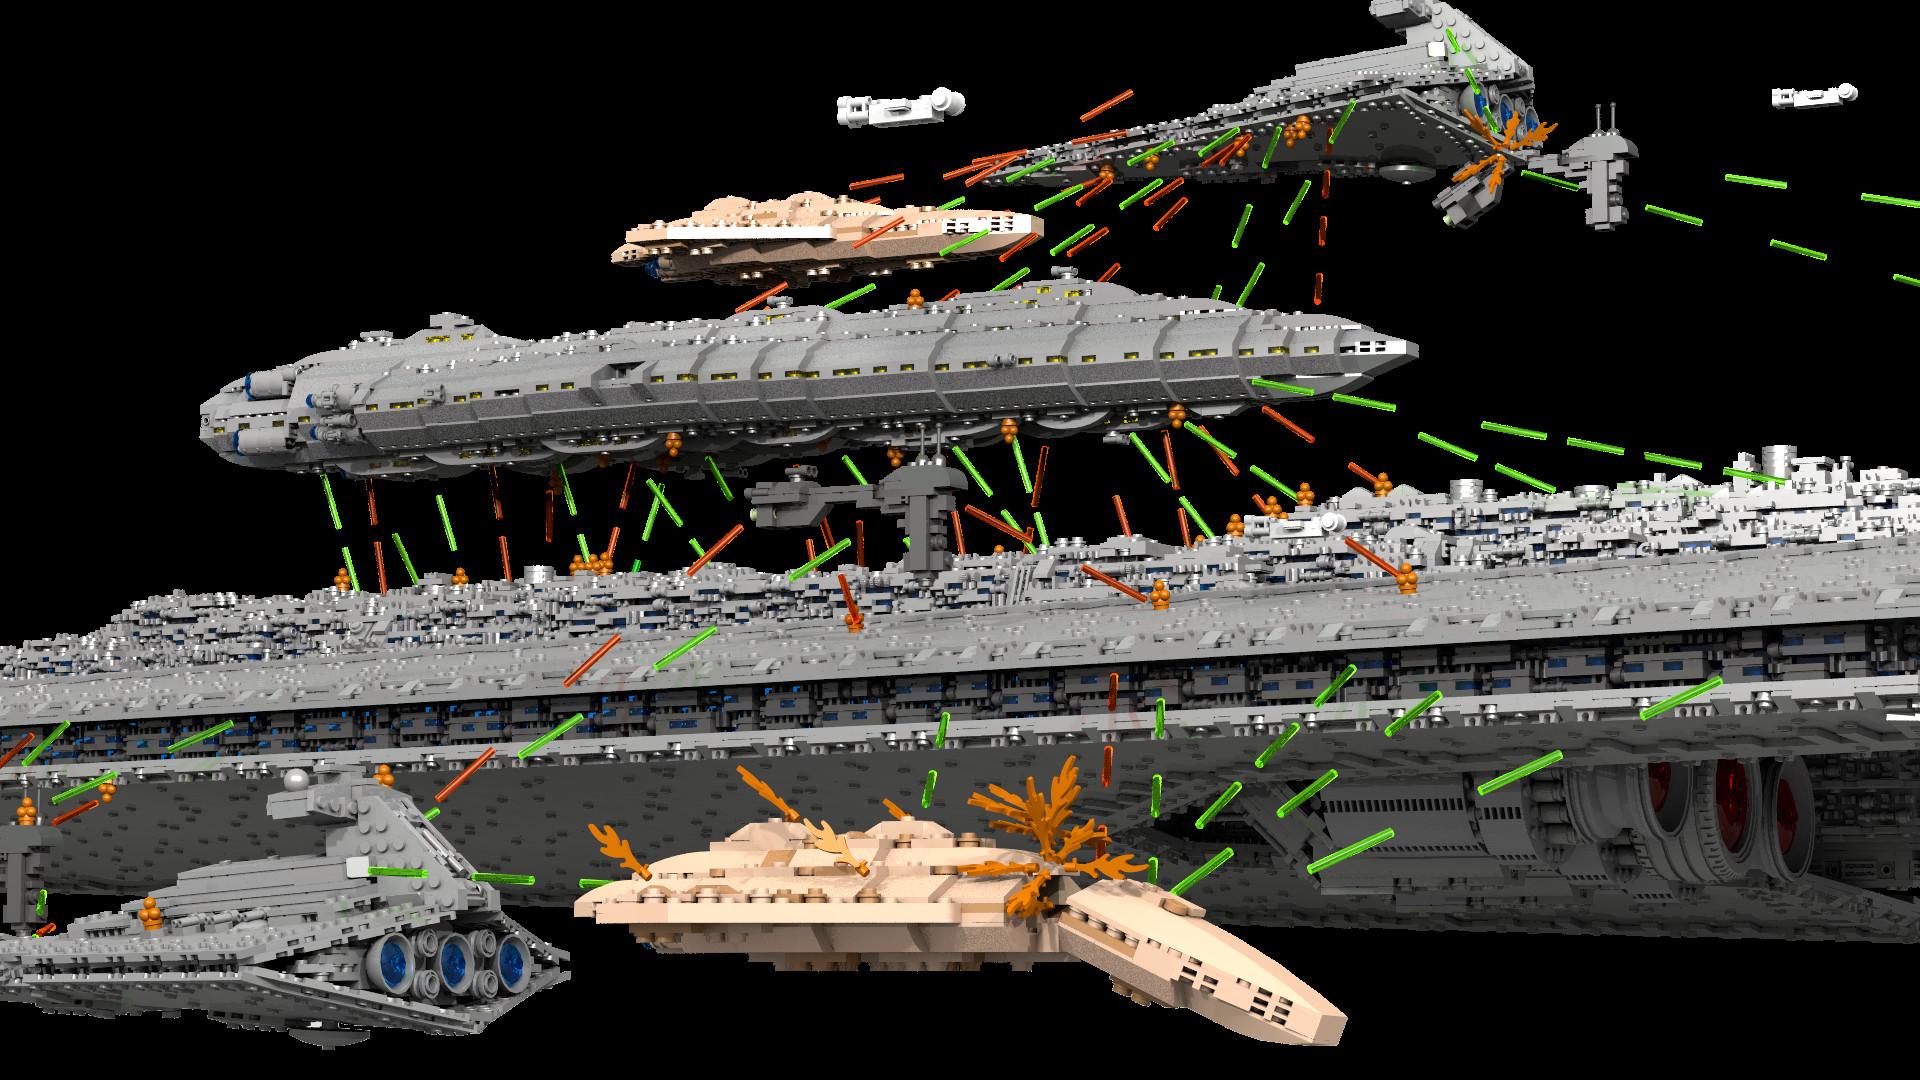 Battle of Endor with 71.000 pieces Super Star Destroyer